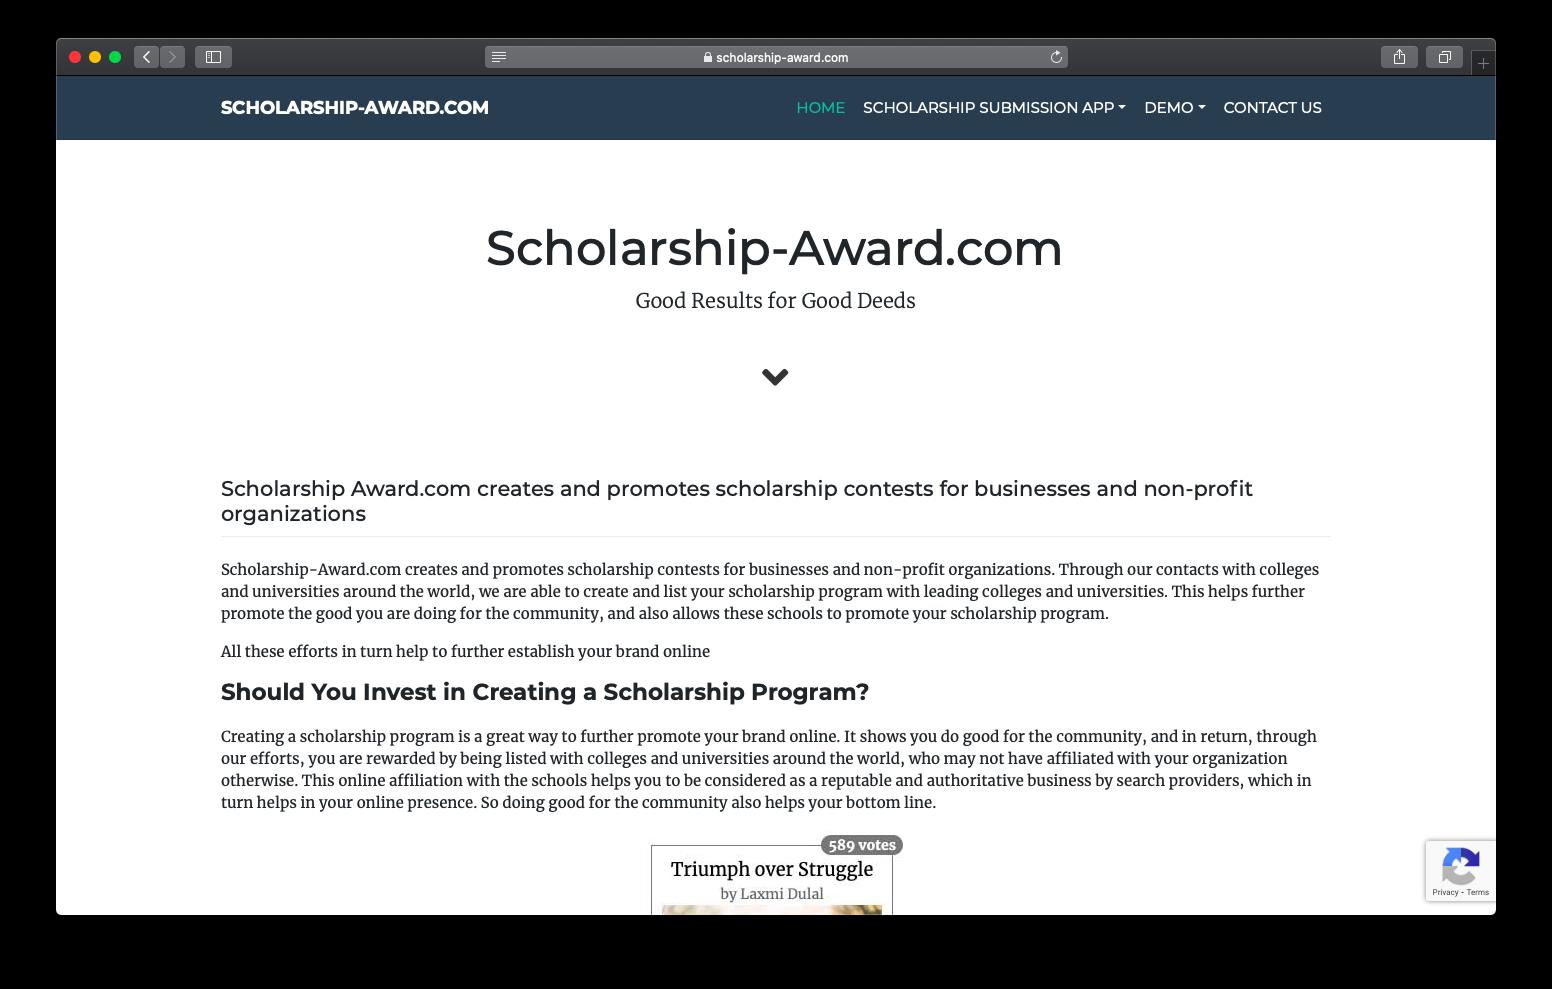 Scholarship-Award.com